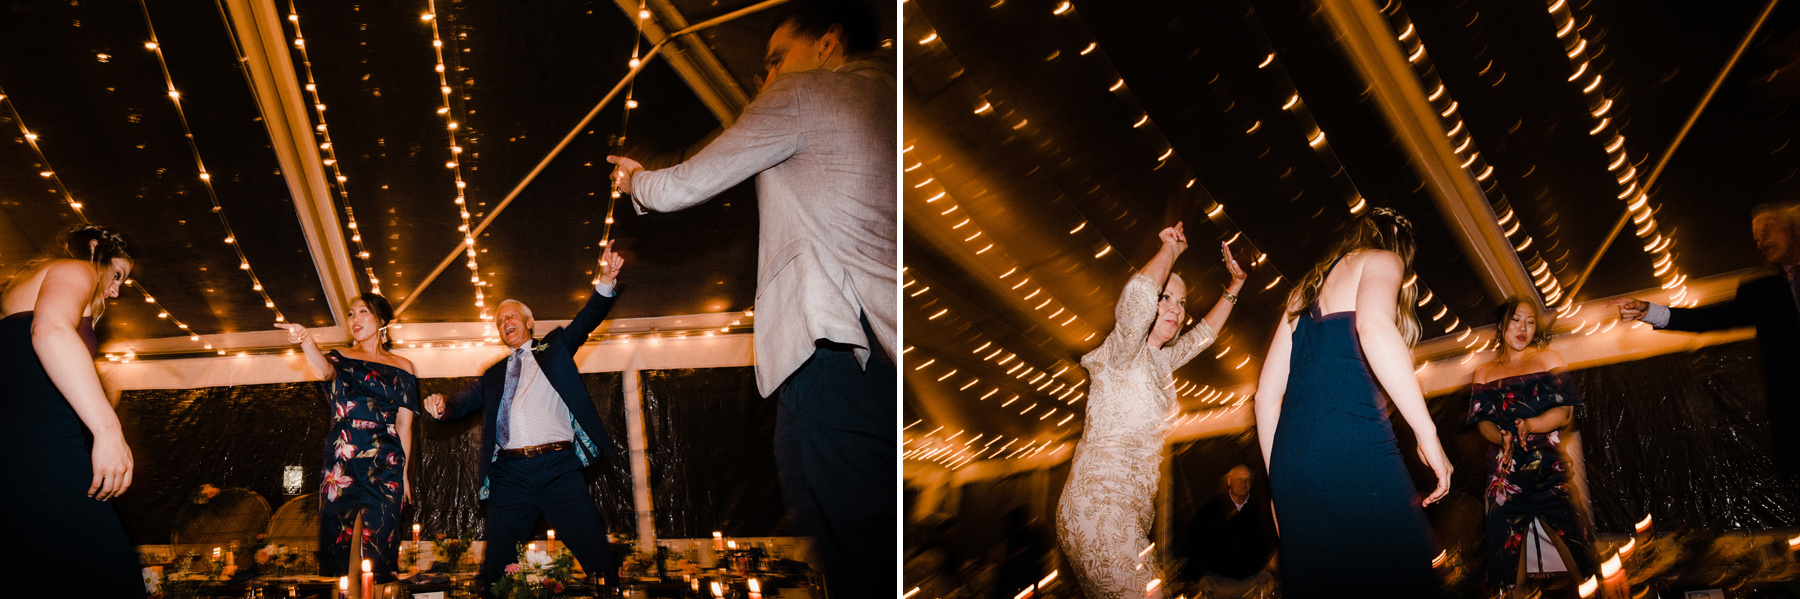 405-colorful-outdoor-lopez-island-wedding.jpg